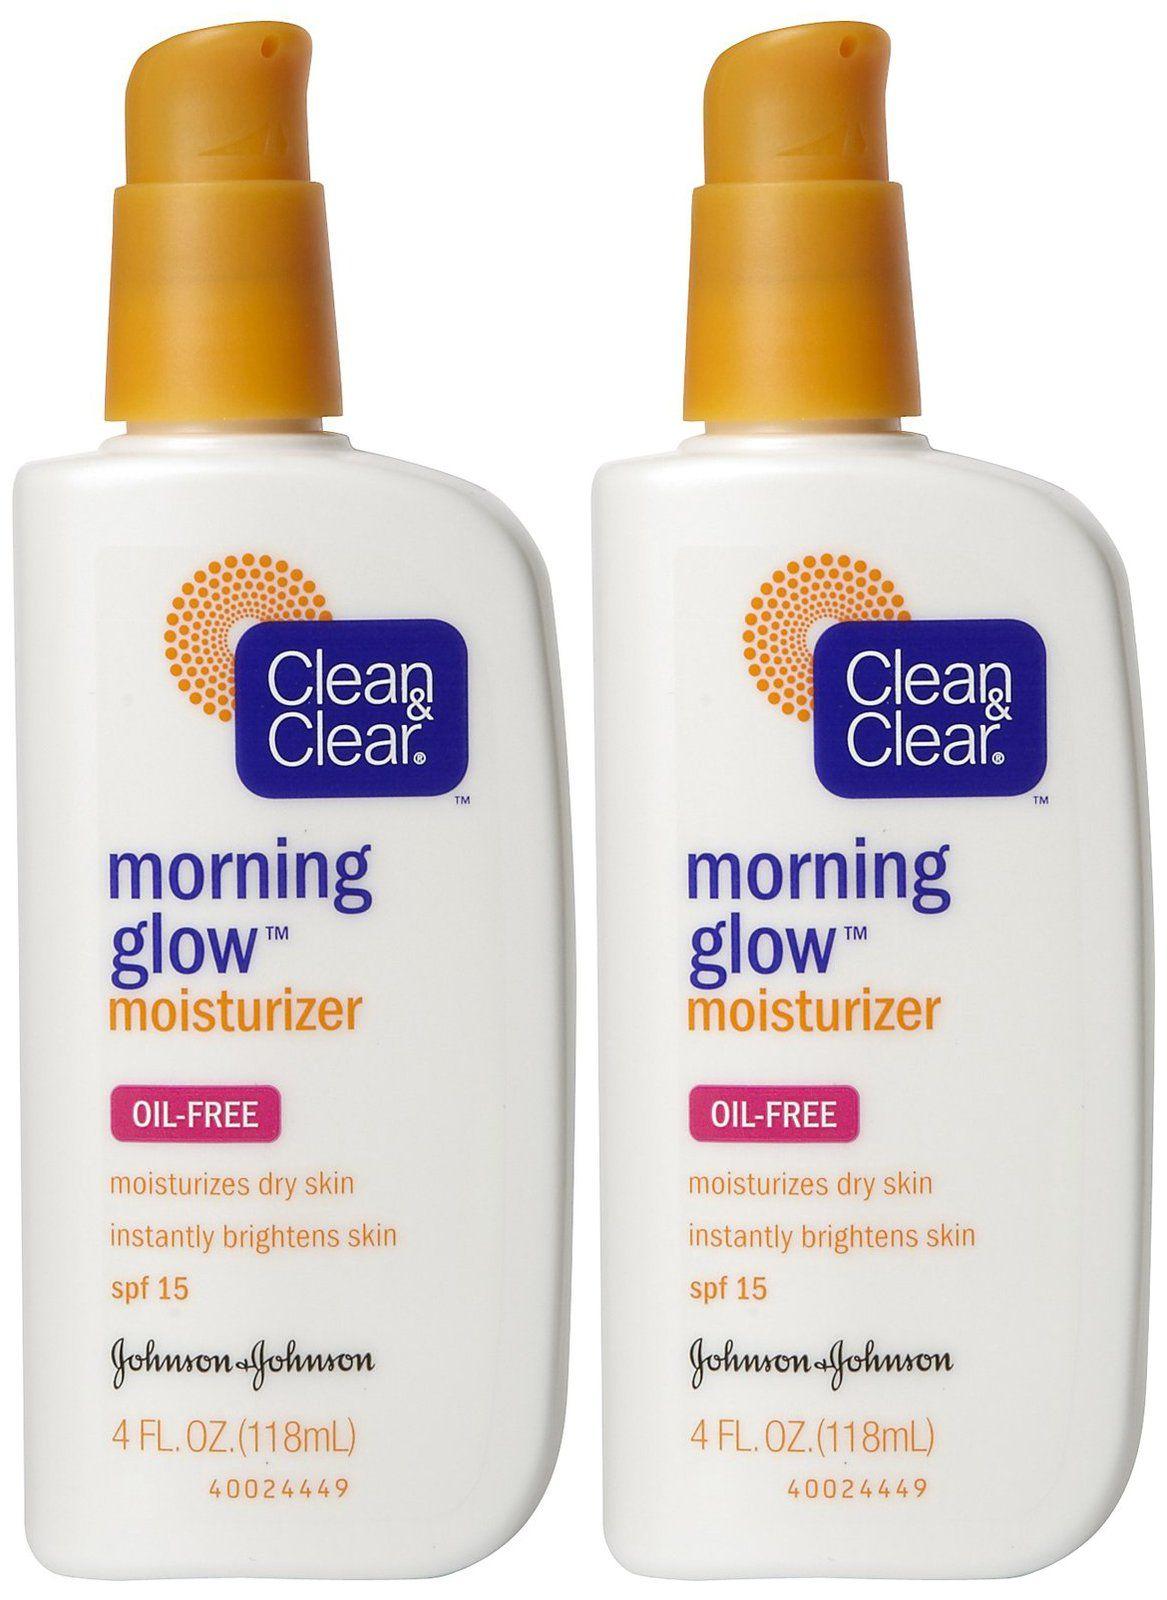 Clean & Clear Morning Glow Moisturizer  Produk jerawat, Perawatan